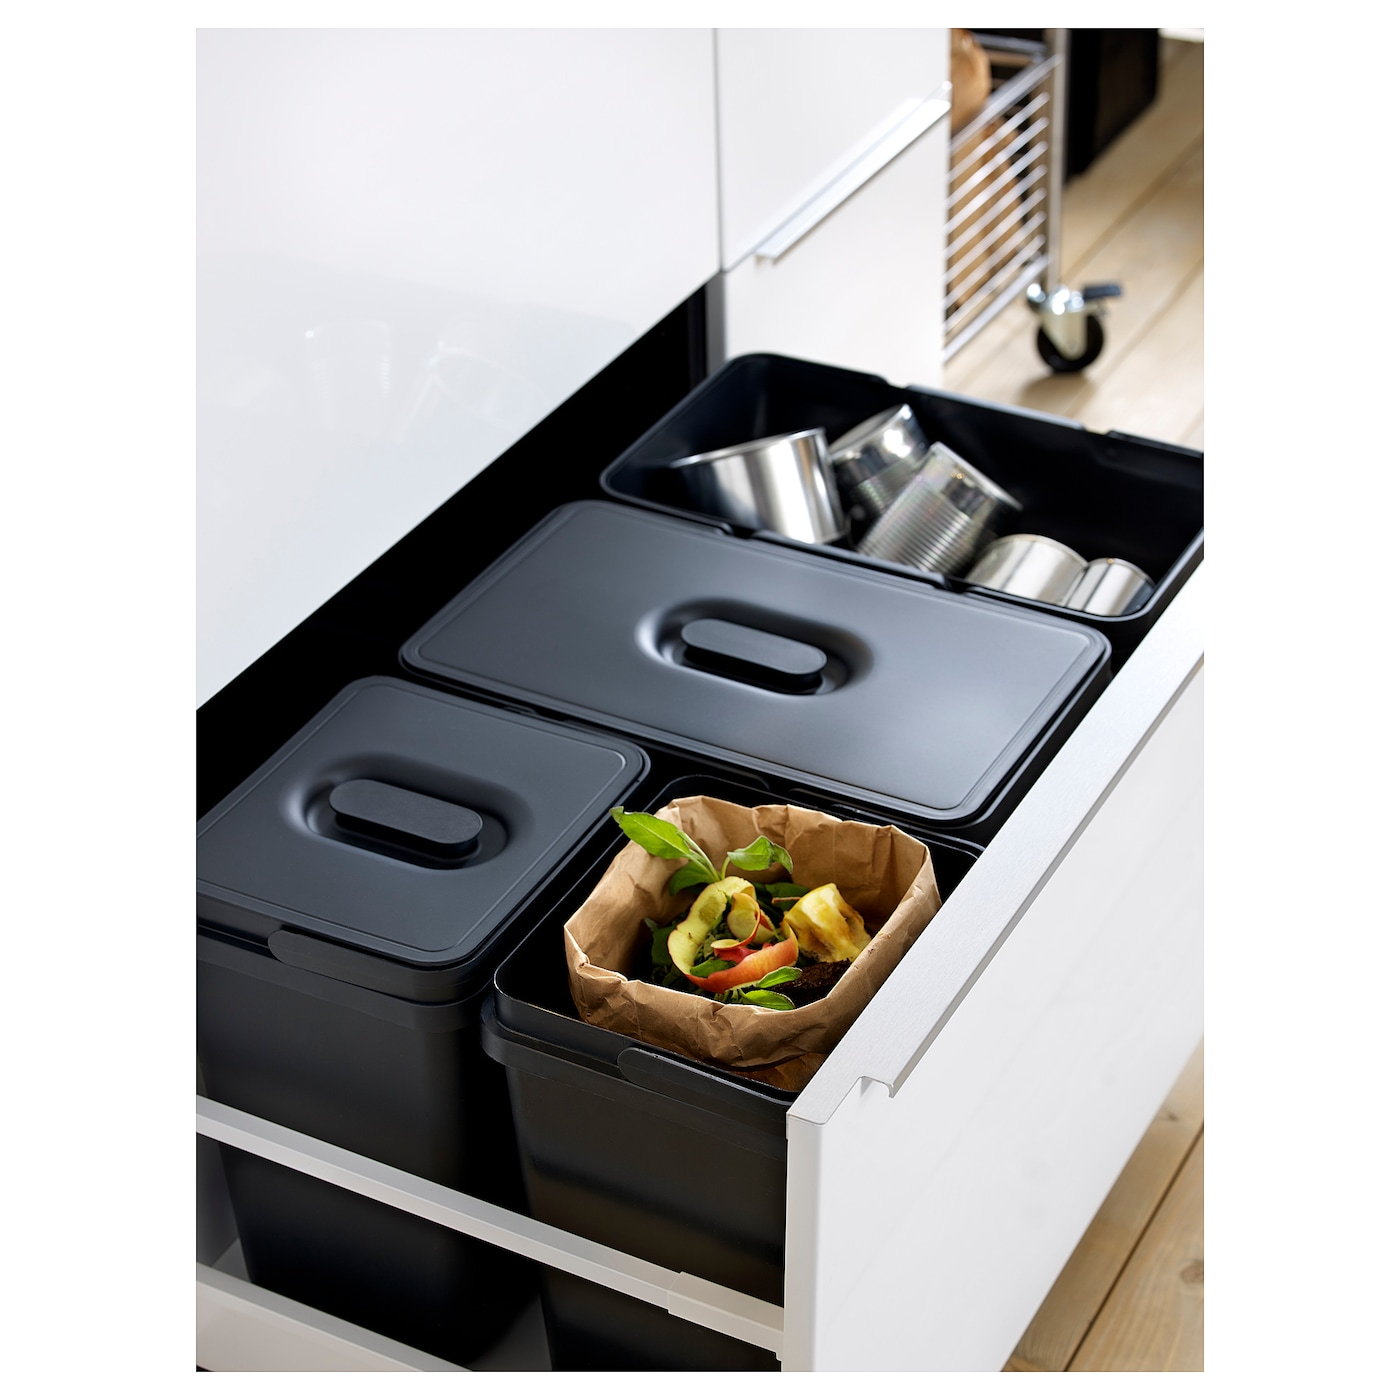 VARIERA - Recycling bin, black